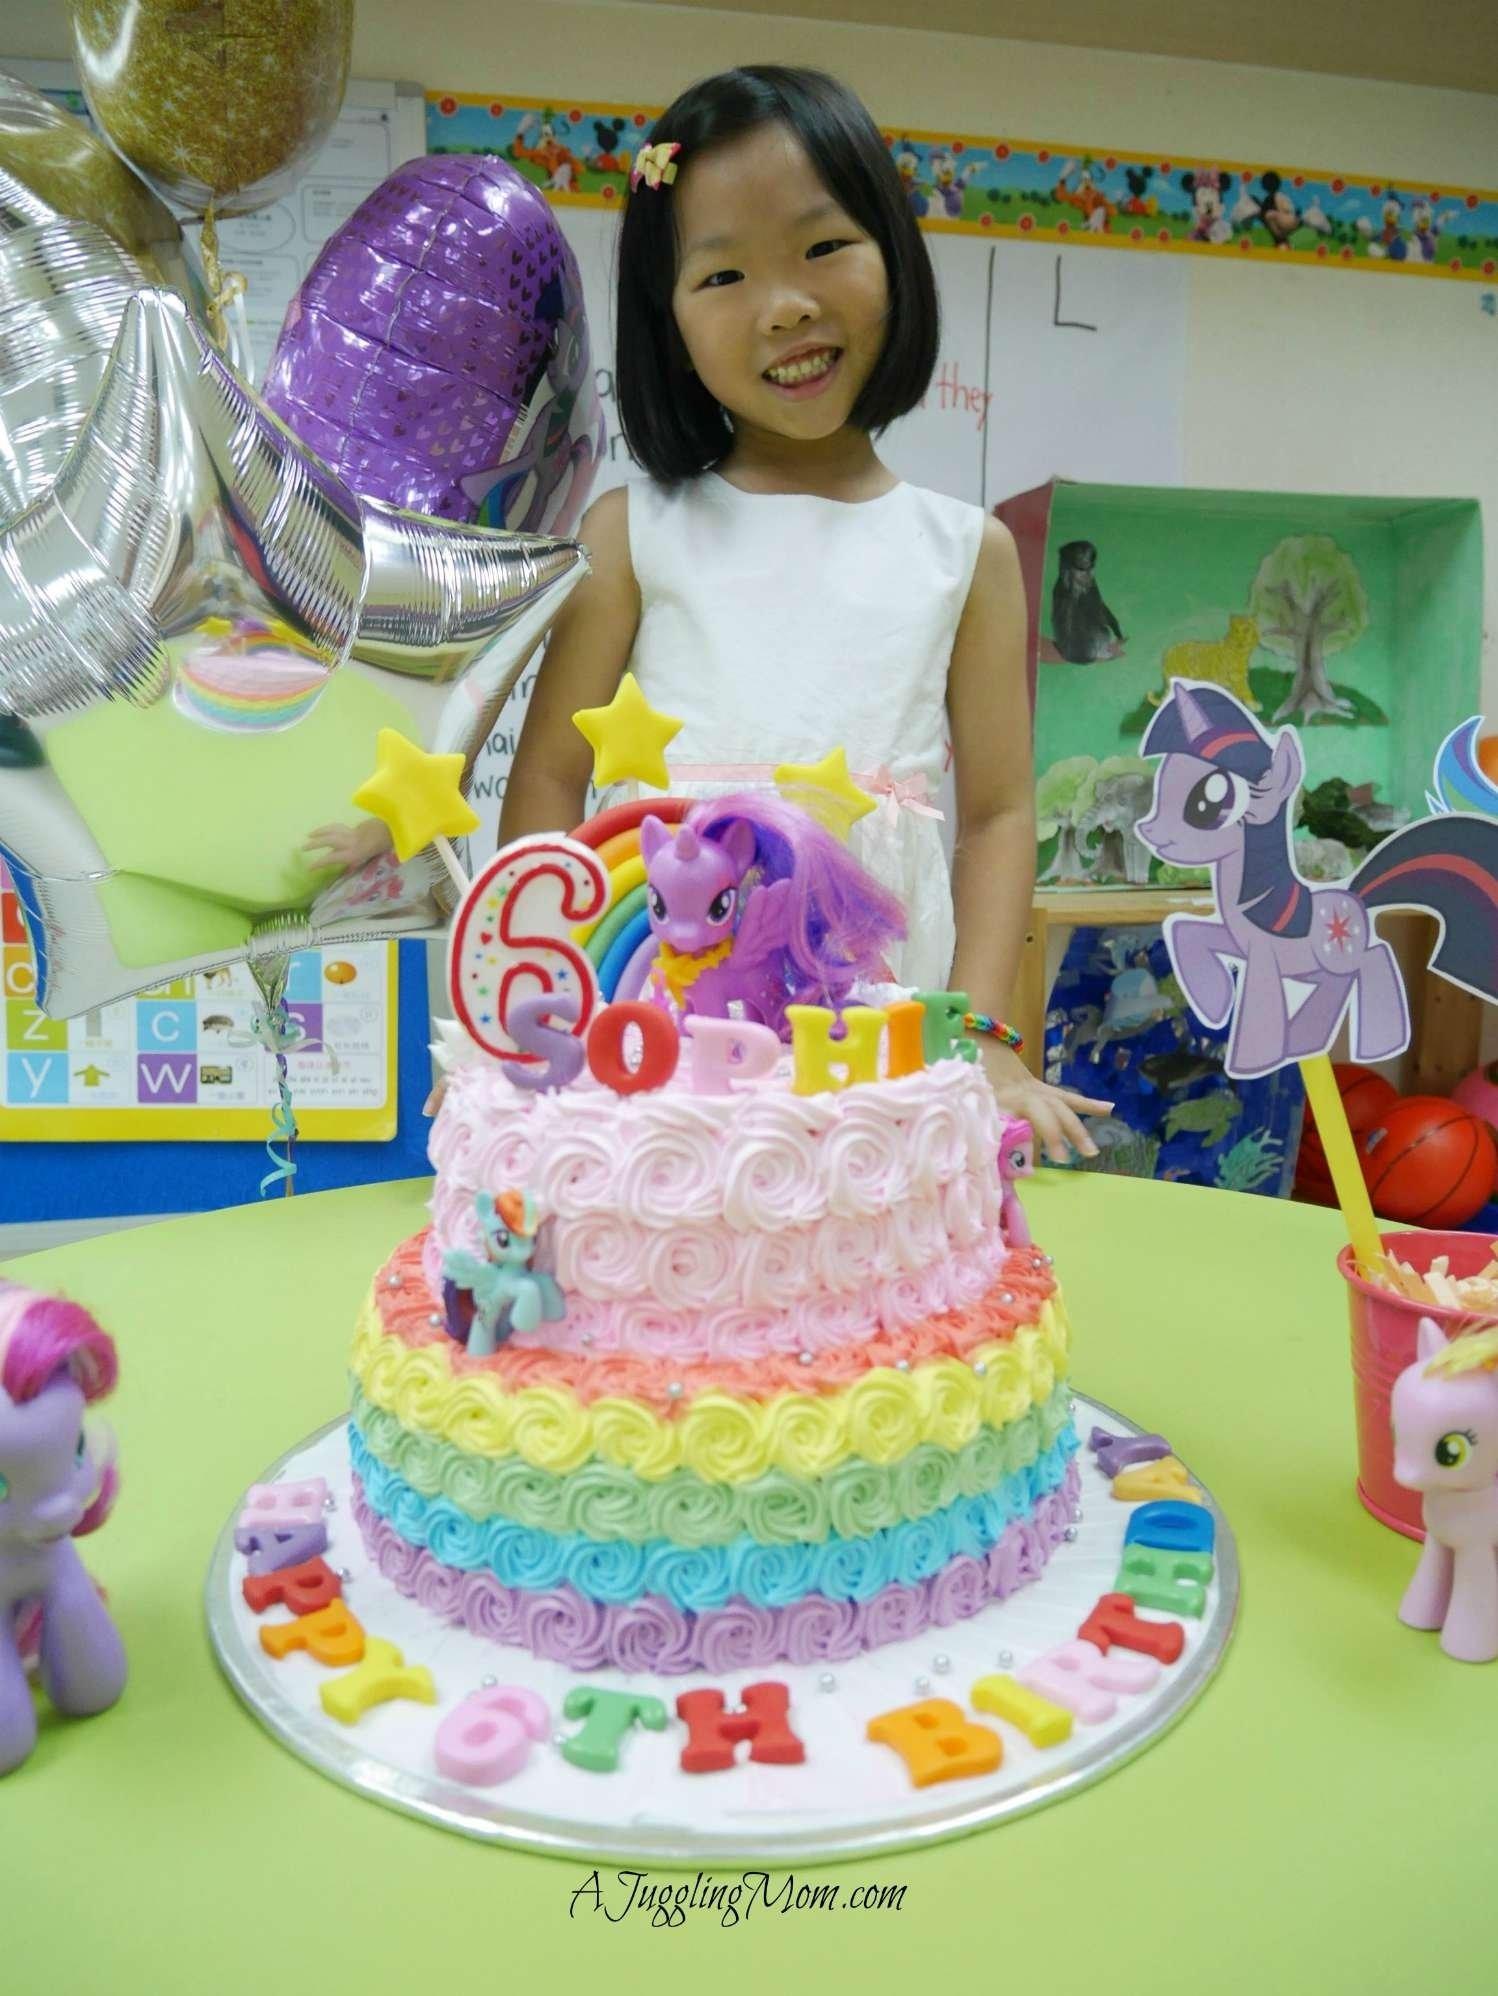 10 Stylish My Little Pony Friendship Is Magic Birthday Party Ideas sophie turns 6 my little pony birthday party friendship is magic 2020